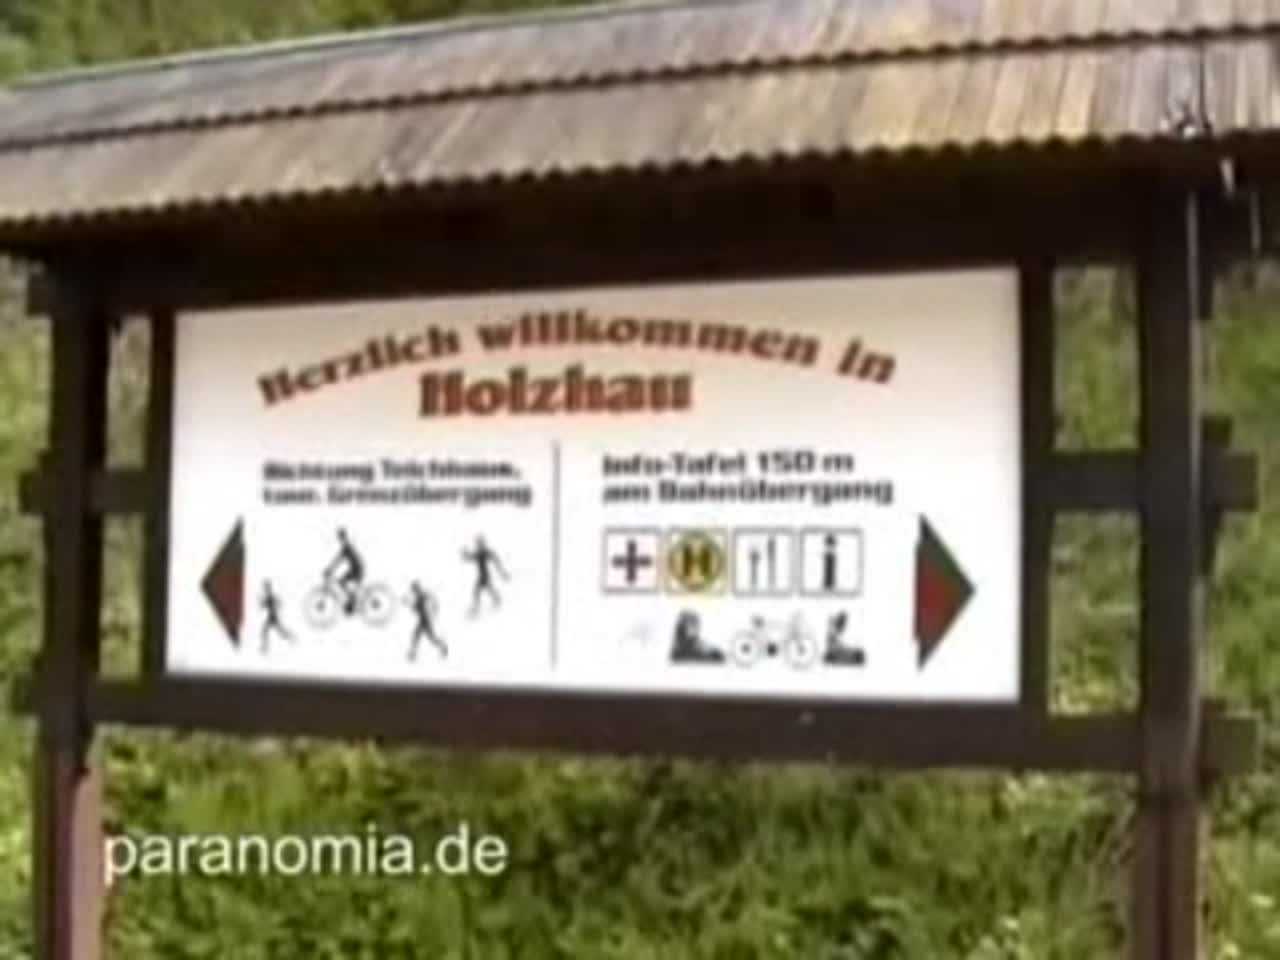 Foto: Dampflok in Holzhau, Eisenbahnfreunde Nossen